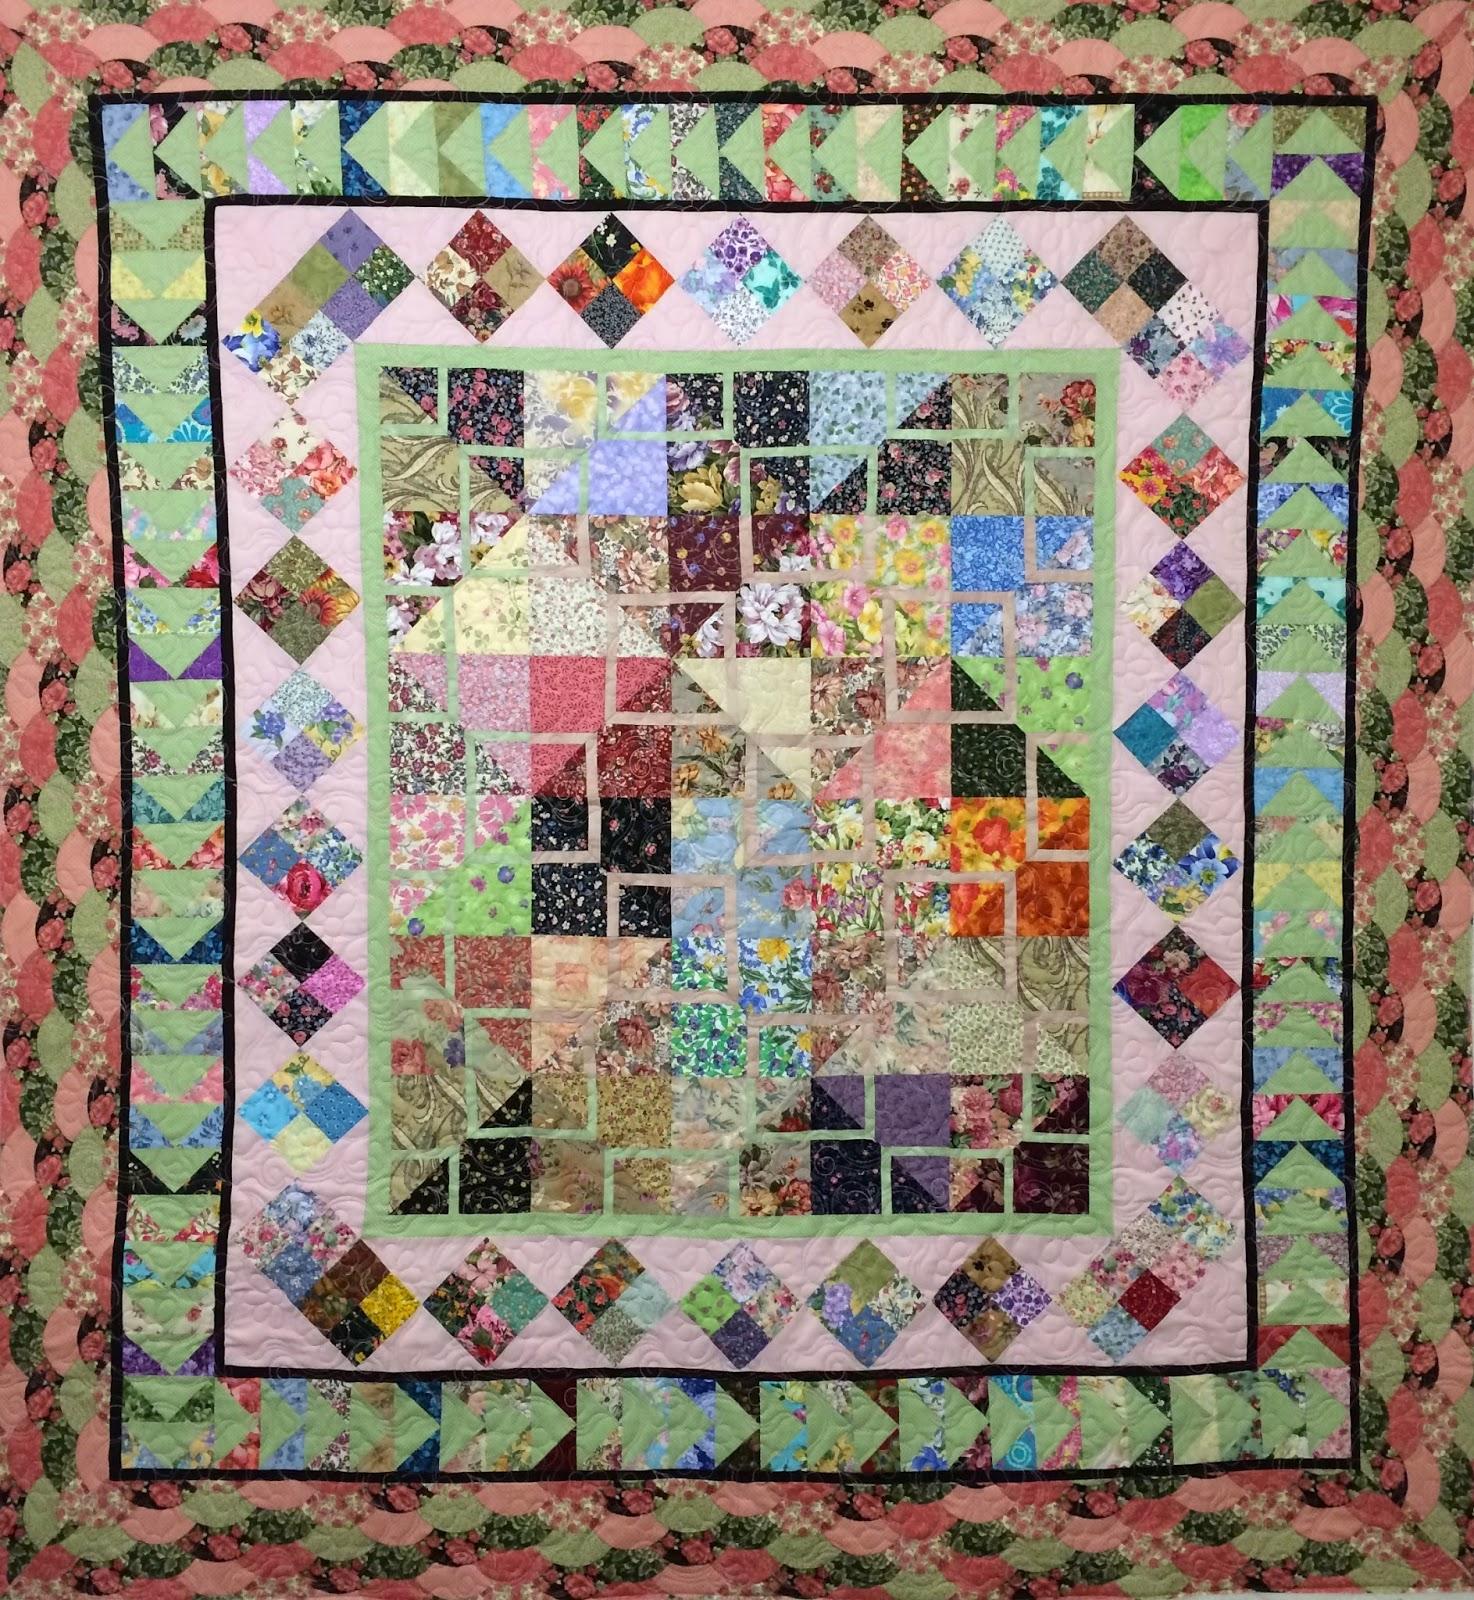 Peggy Krebs Pink & Green Floral Quilt